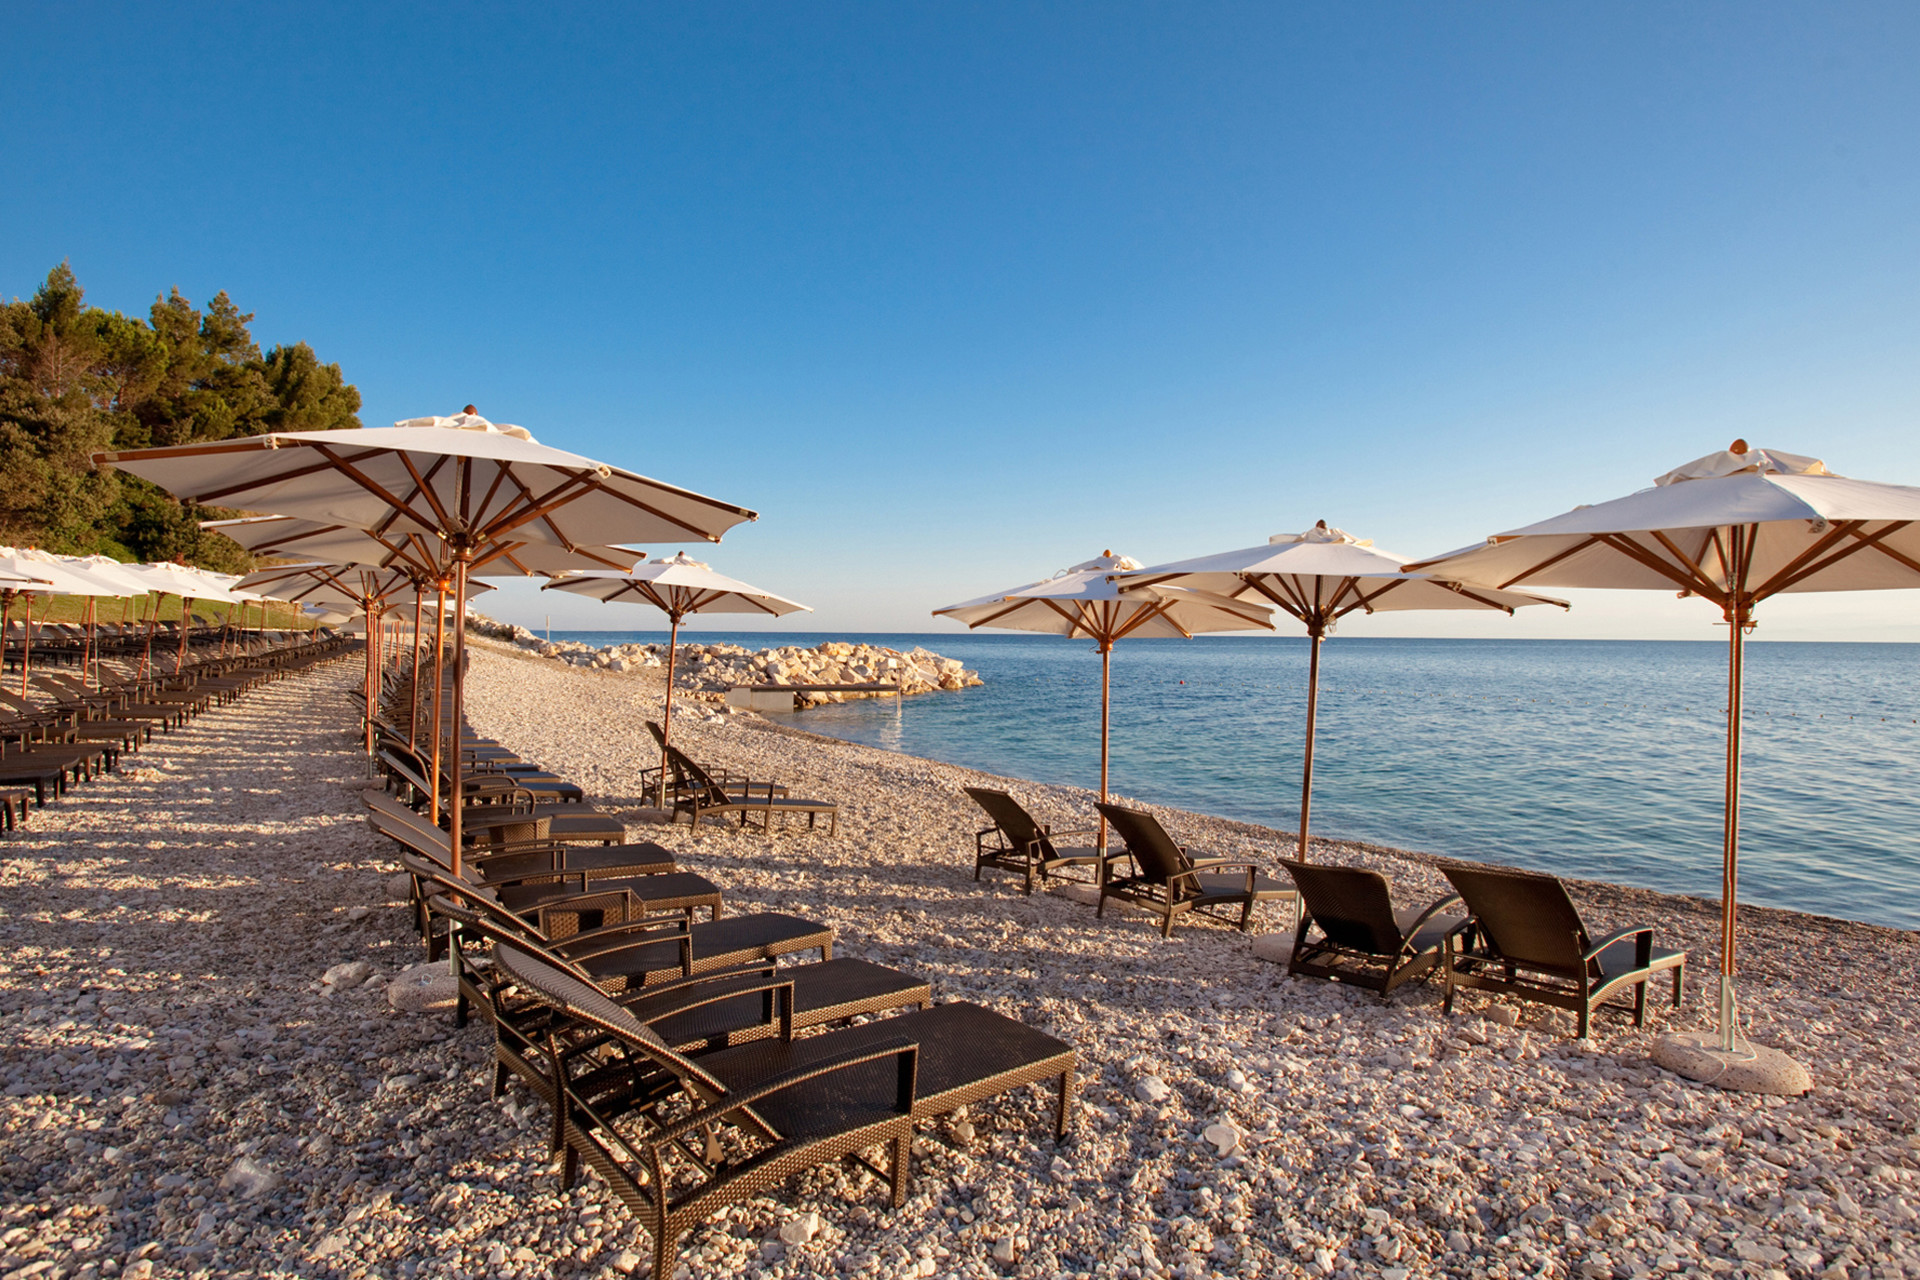 Golfreisebericht über Kroatien, Istrien - Kempinski Hotel Adriatic